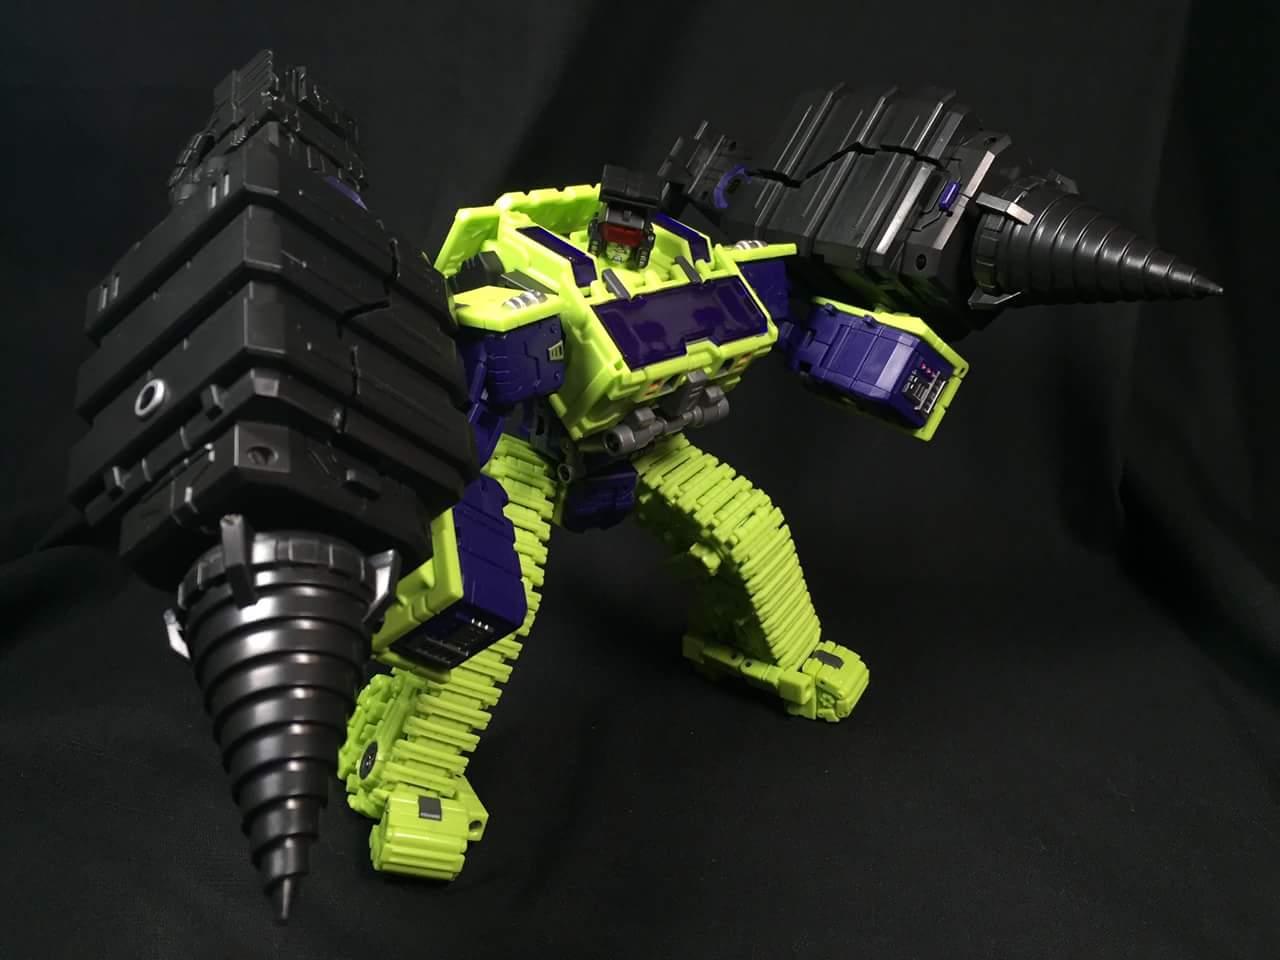 [Toyworld] Produit Tiers - Jouet TW-C Constructor aka Devastator/Dévastateur (Version vert G1 et jaune G2) - Page 3 HCzsxNqo